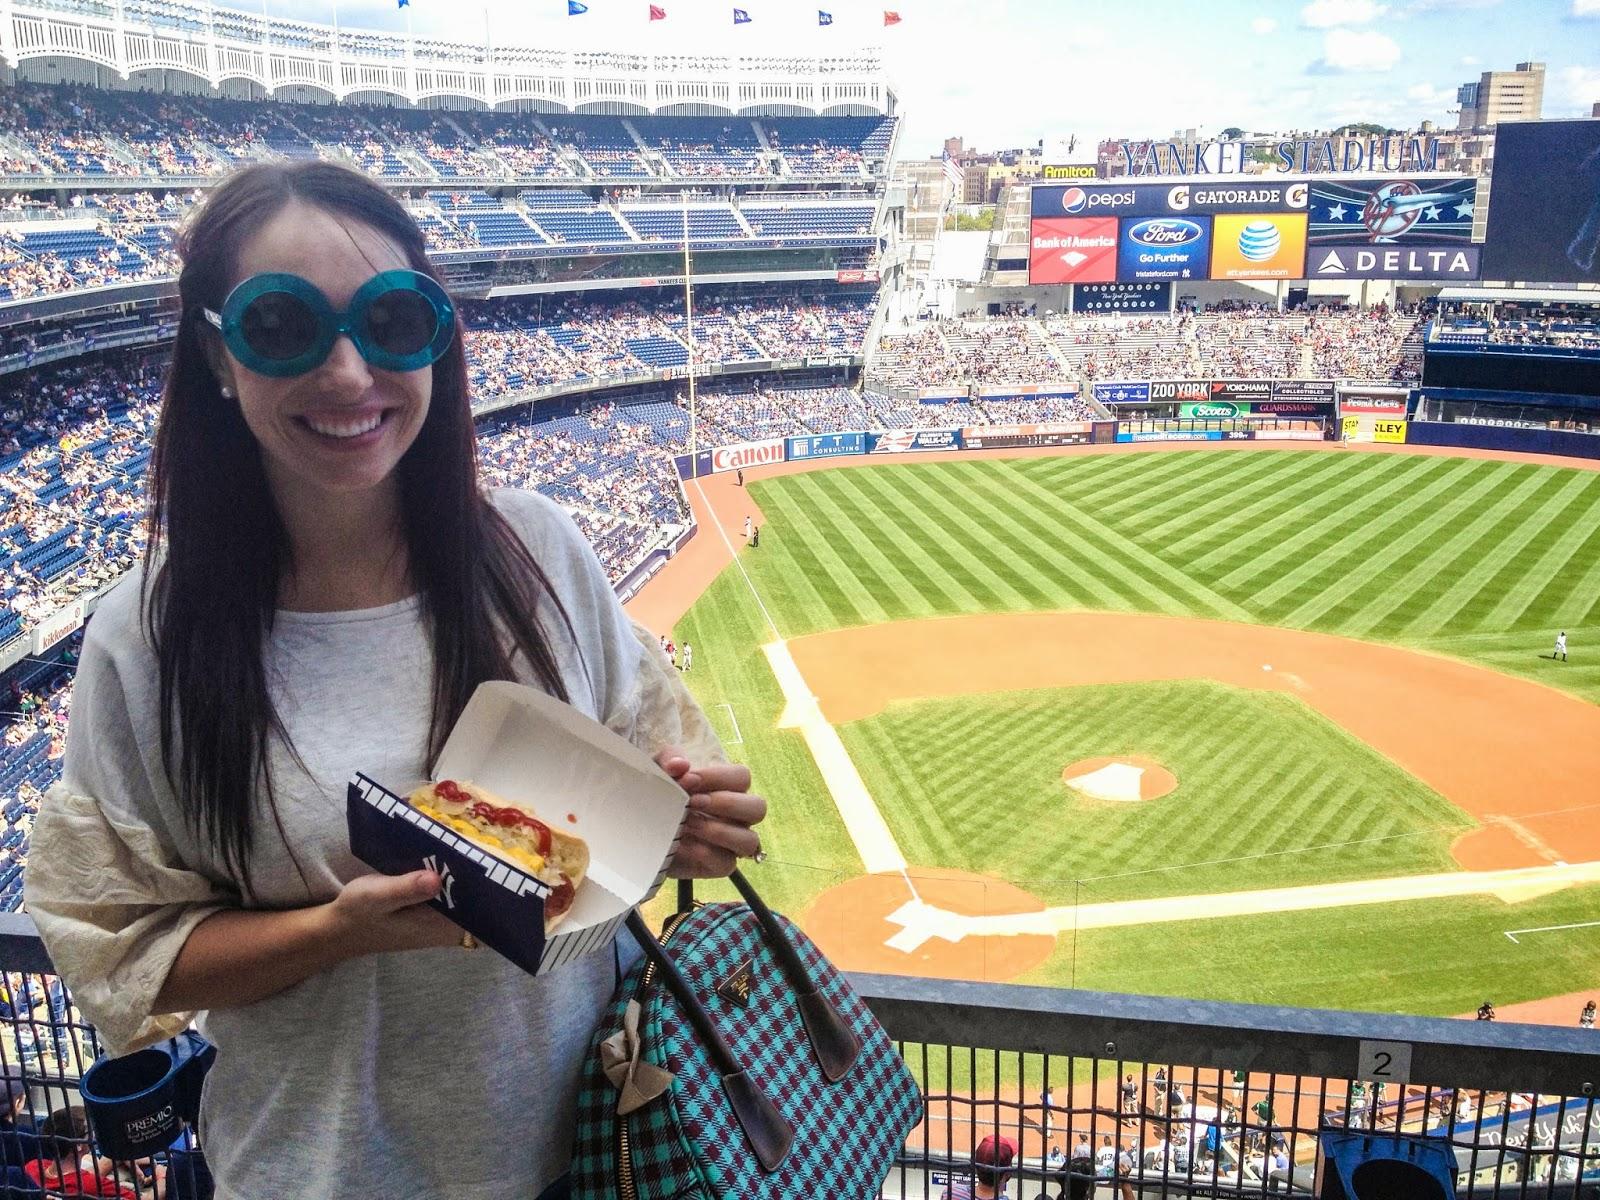 yankees vs red socks, yankees game, yankees stadium, new york yankees, yankee hotdog, ball game, anthropologie ootd